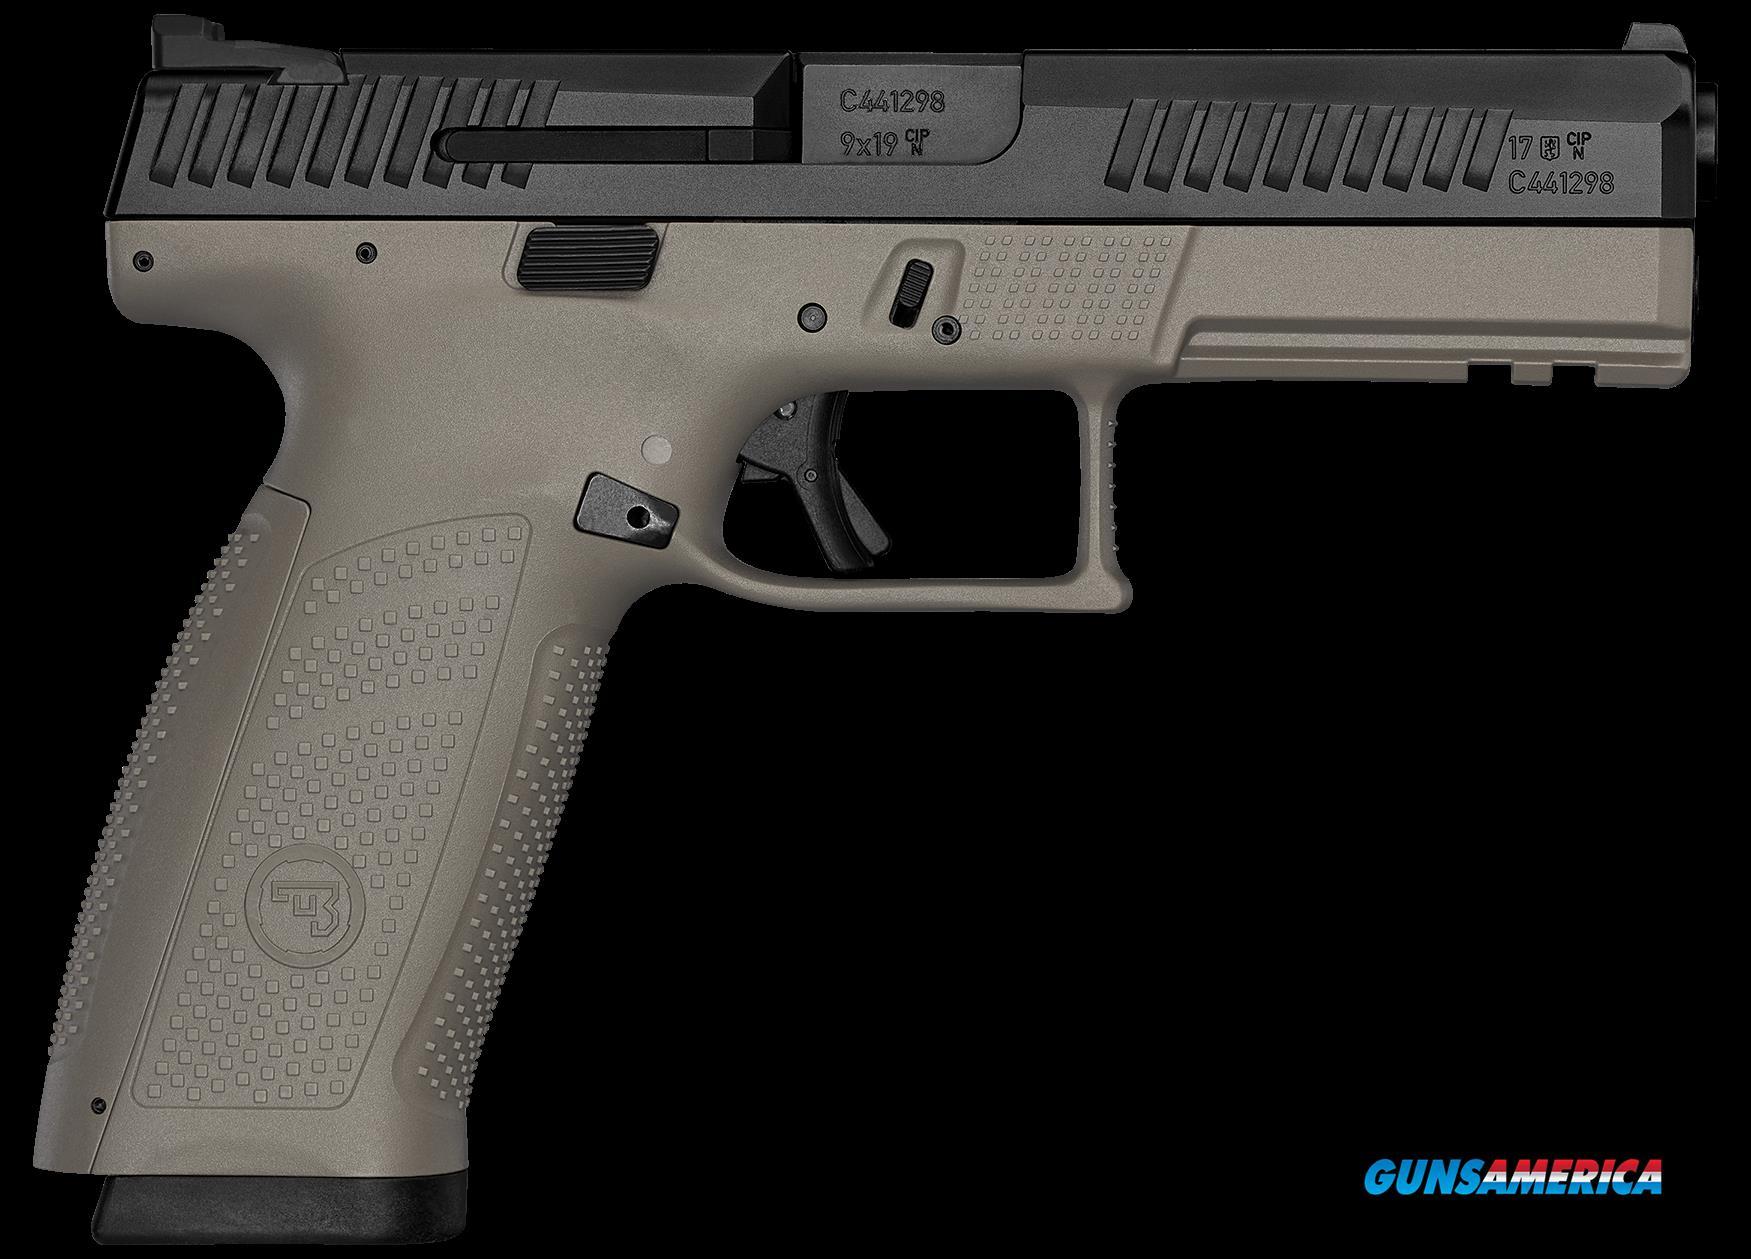 Cz P-10, Cz 01541 P10 F 9mm Fde-blk Ns                 10rd  Guns > Pistols > 1911 Pistol Copies (non-Colt)